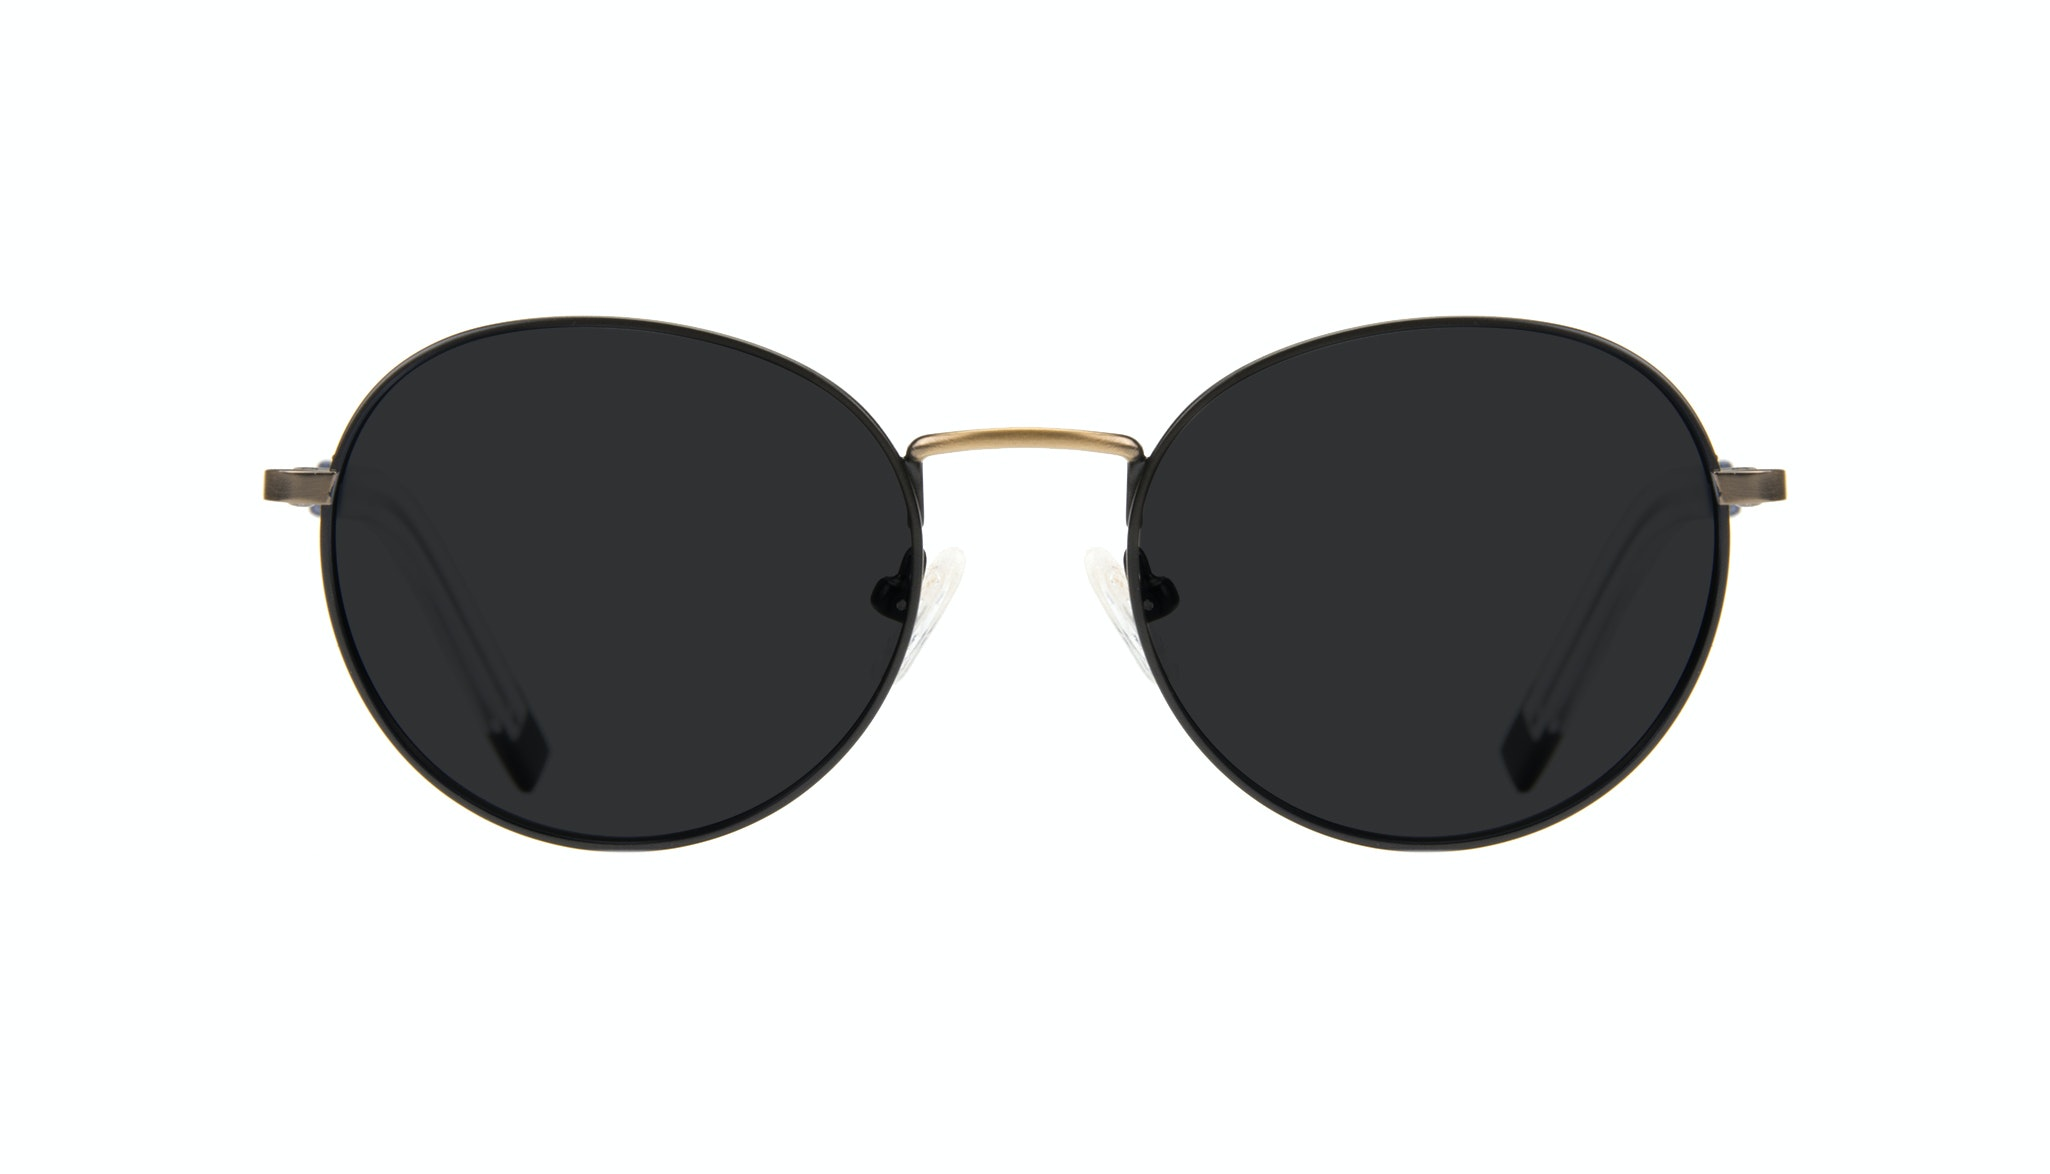 Affordable Fashion Glasses Round Sunglasses Men Lean Dark Brass